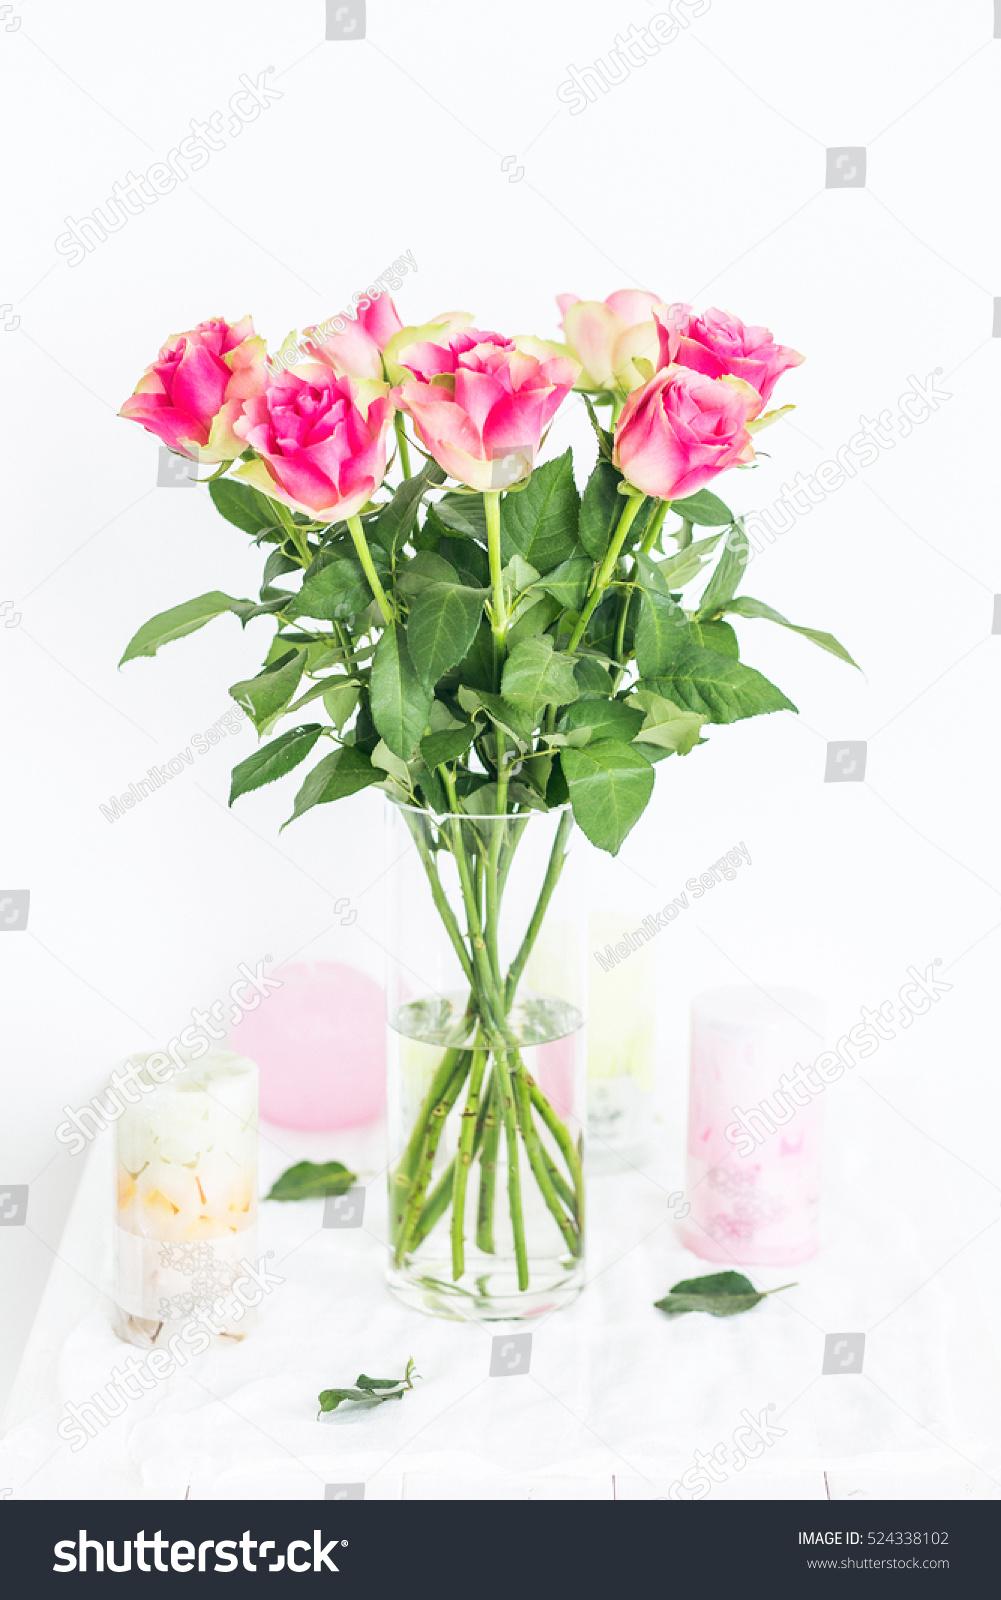 Bouquet beautiful flowers roses catalog on stock photo edit now bouquet of beautiful flowers of roses for catalog on white background izmirmasajfo